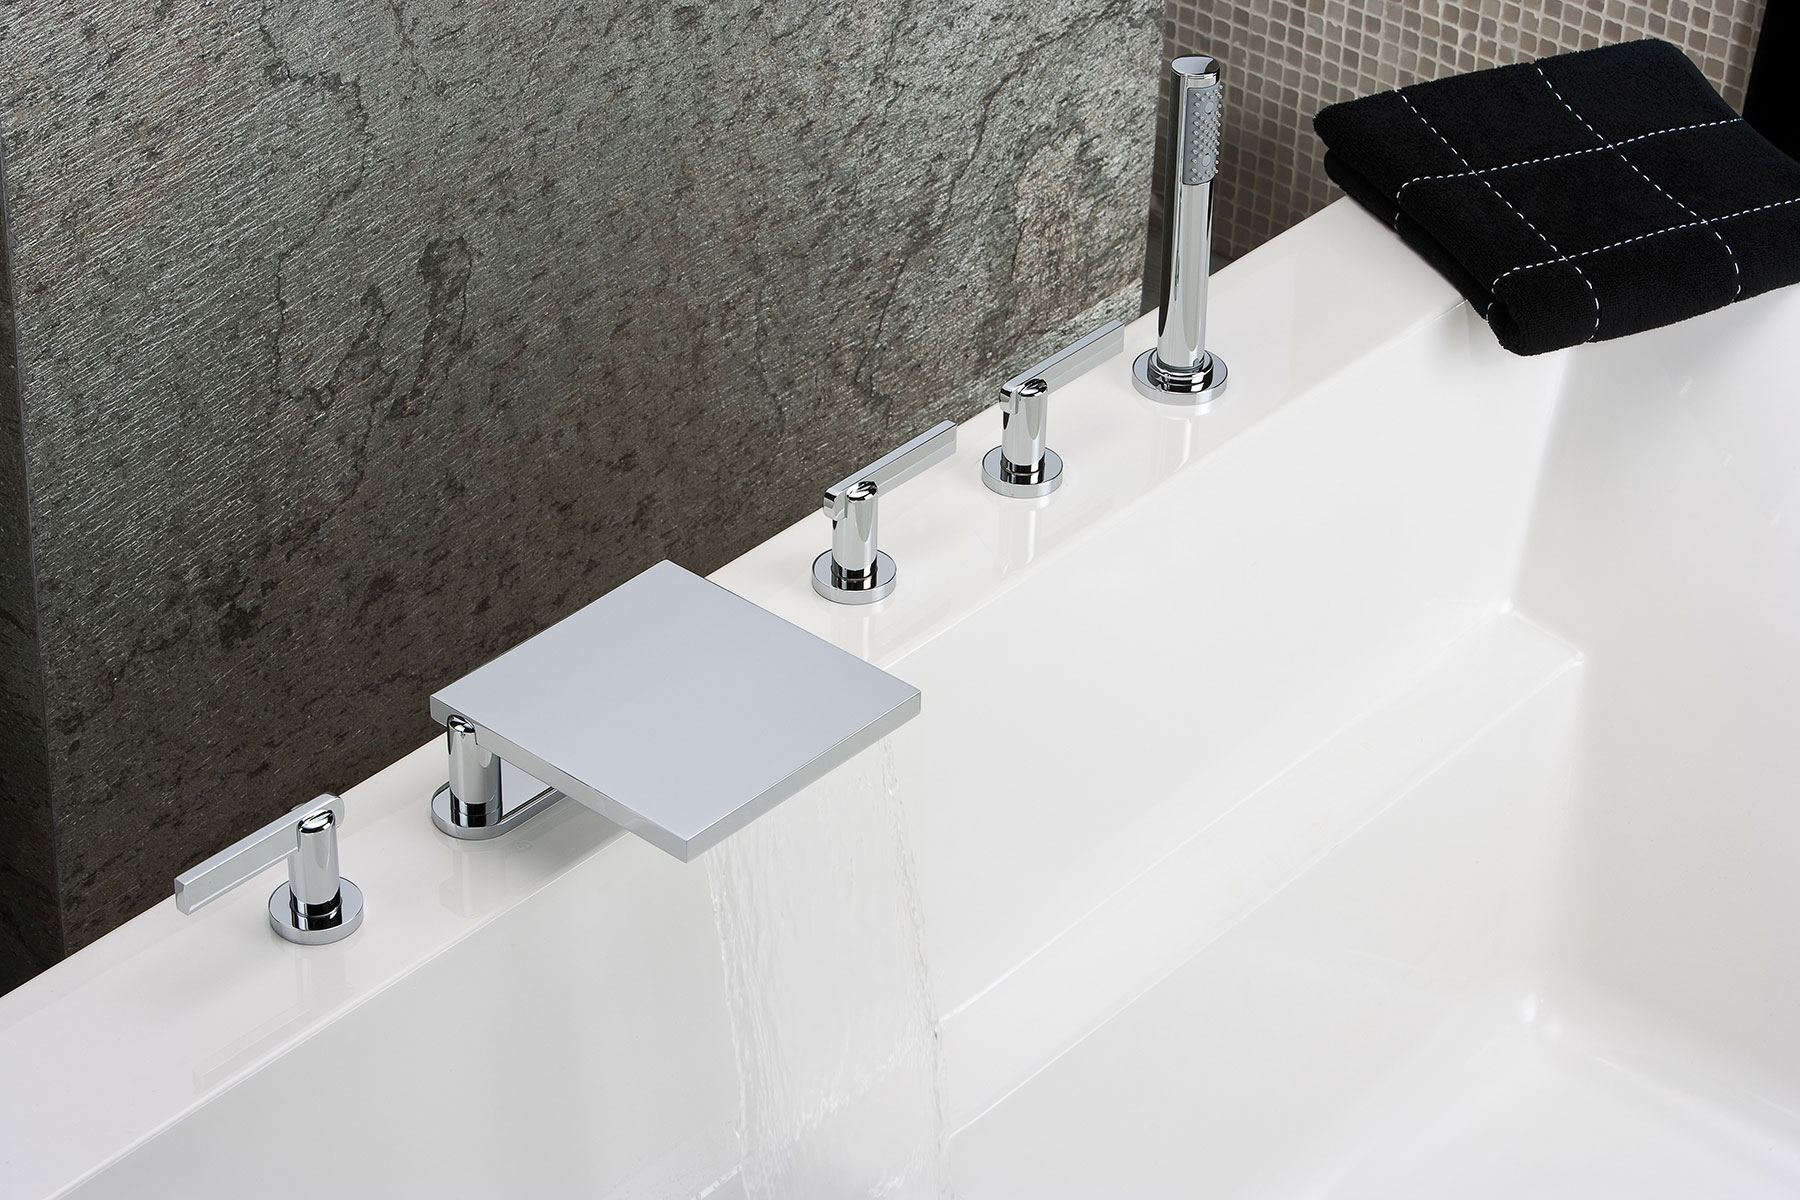 Modern Pinto Deck Mount Tub Filler